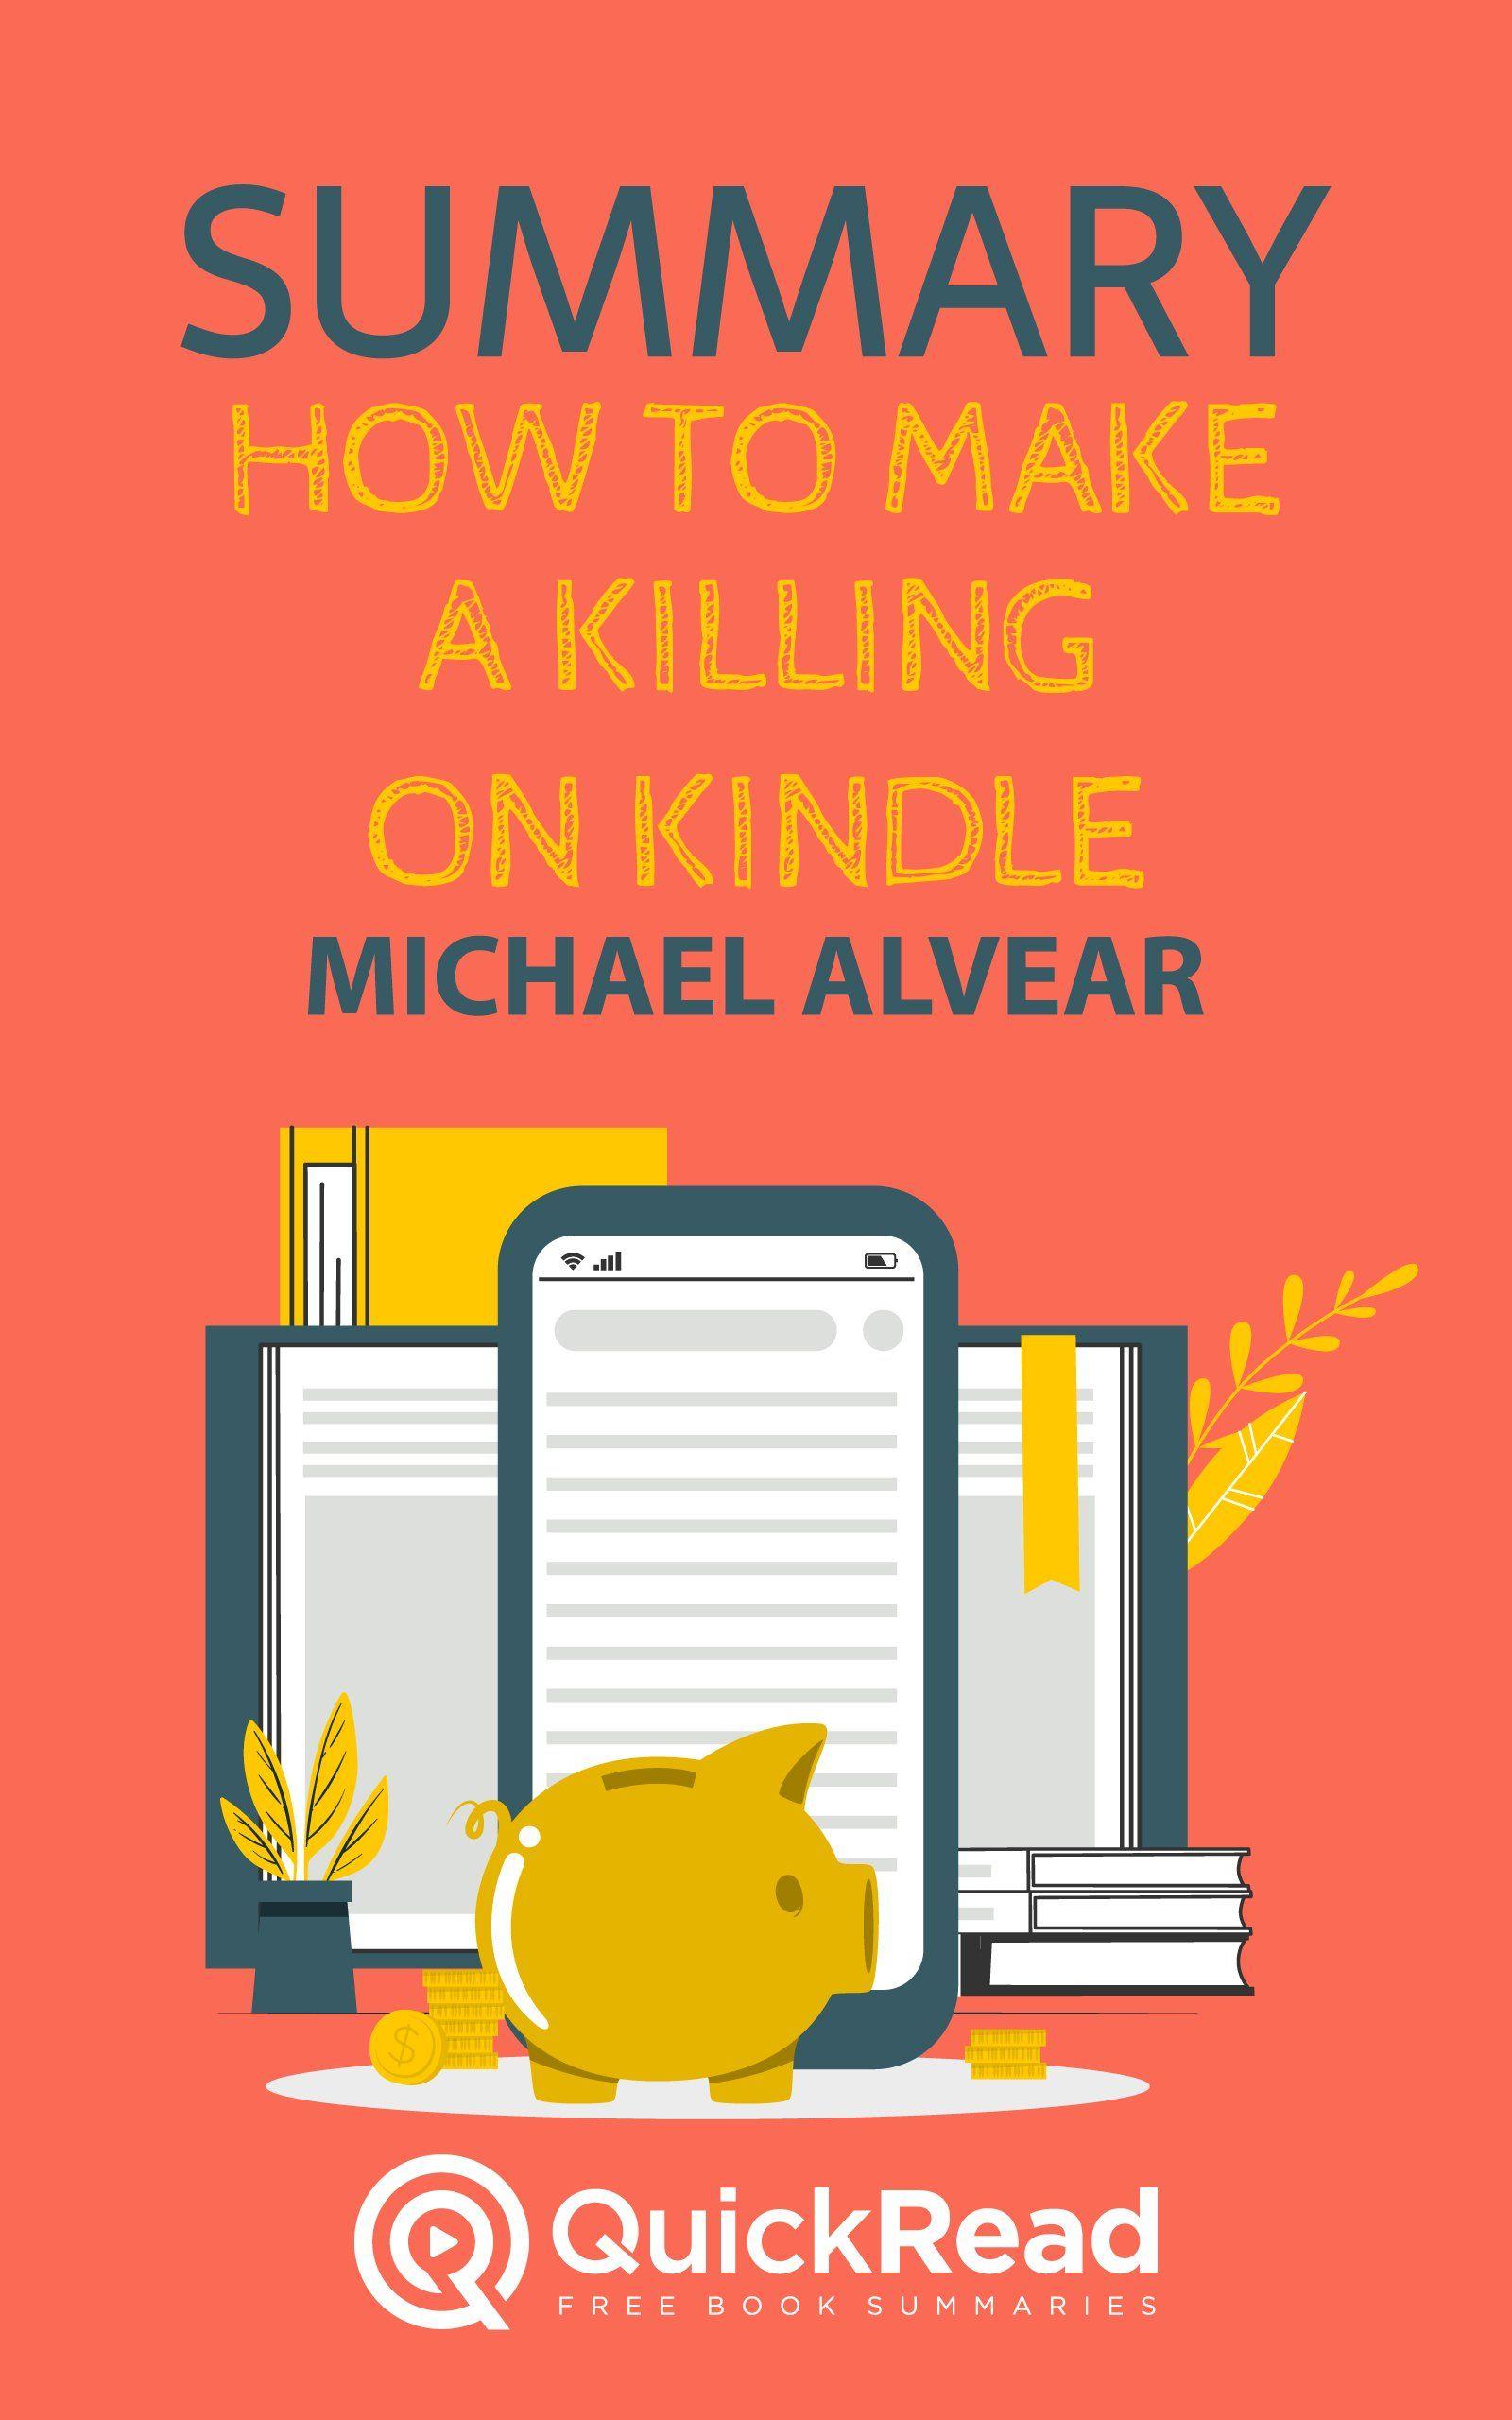 How to Make a Killing on Kindle